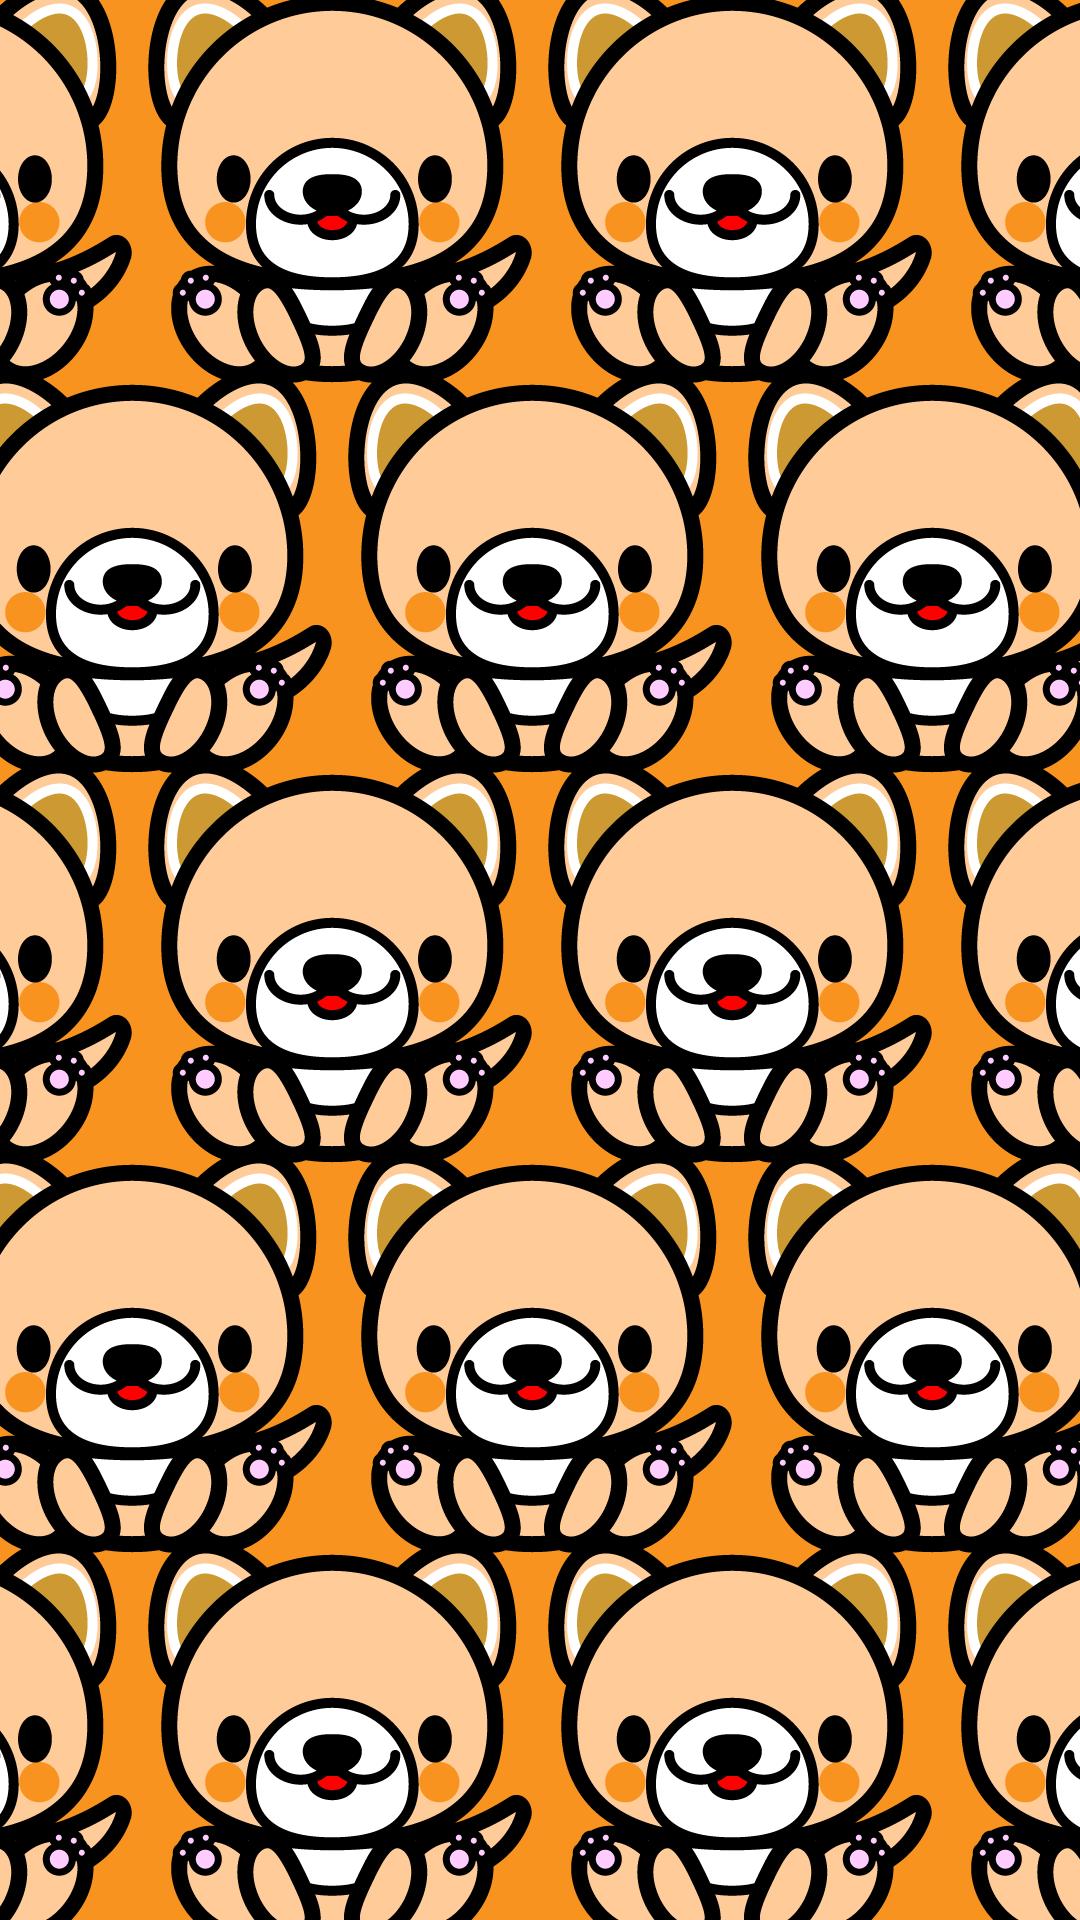 wallpaper1_sitdog-fill-orange-iphone